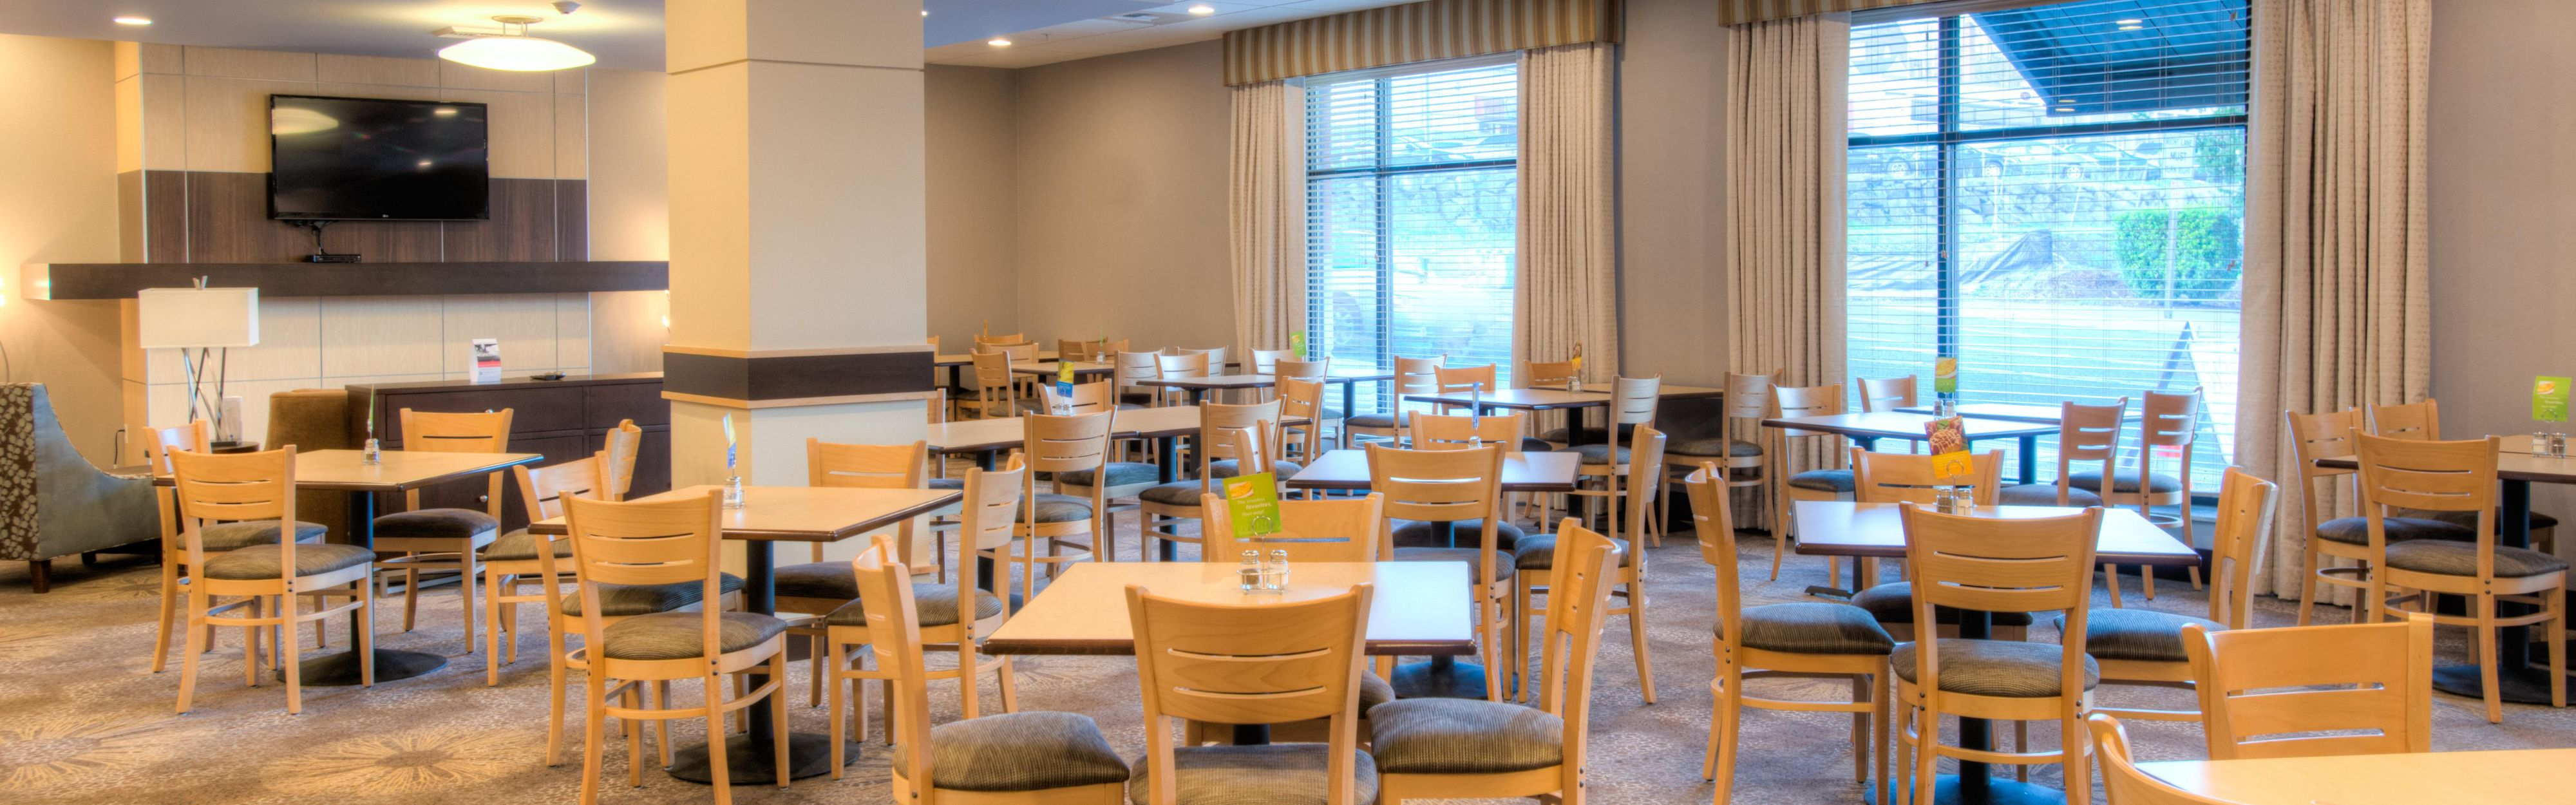 Hotels In Tacoma Wa Near Convention Center